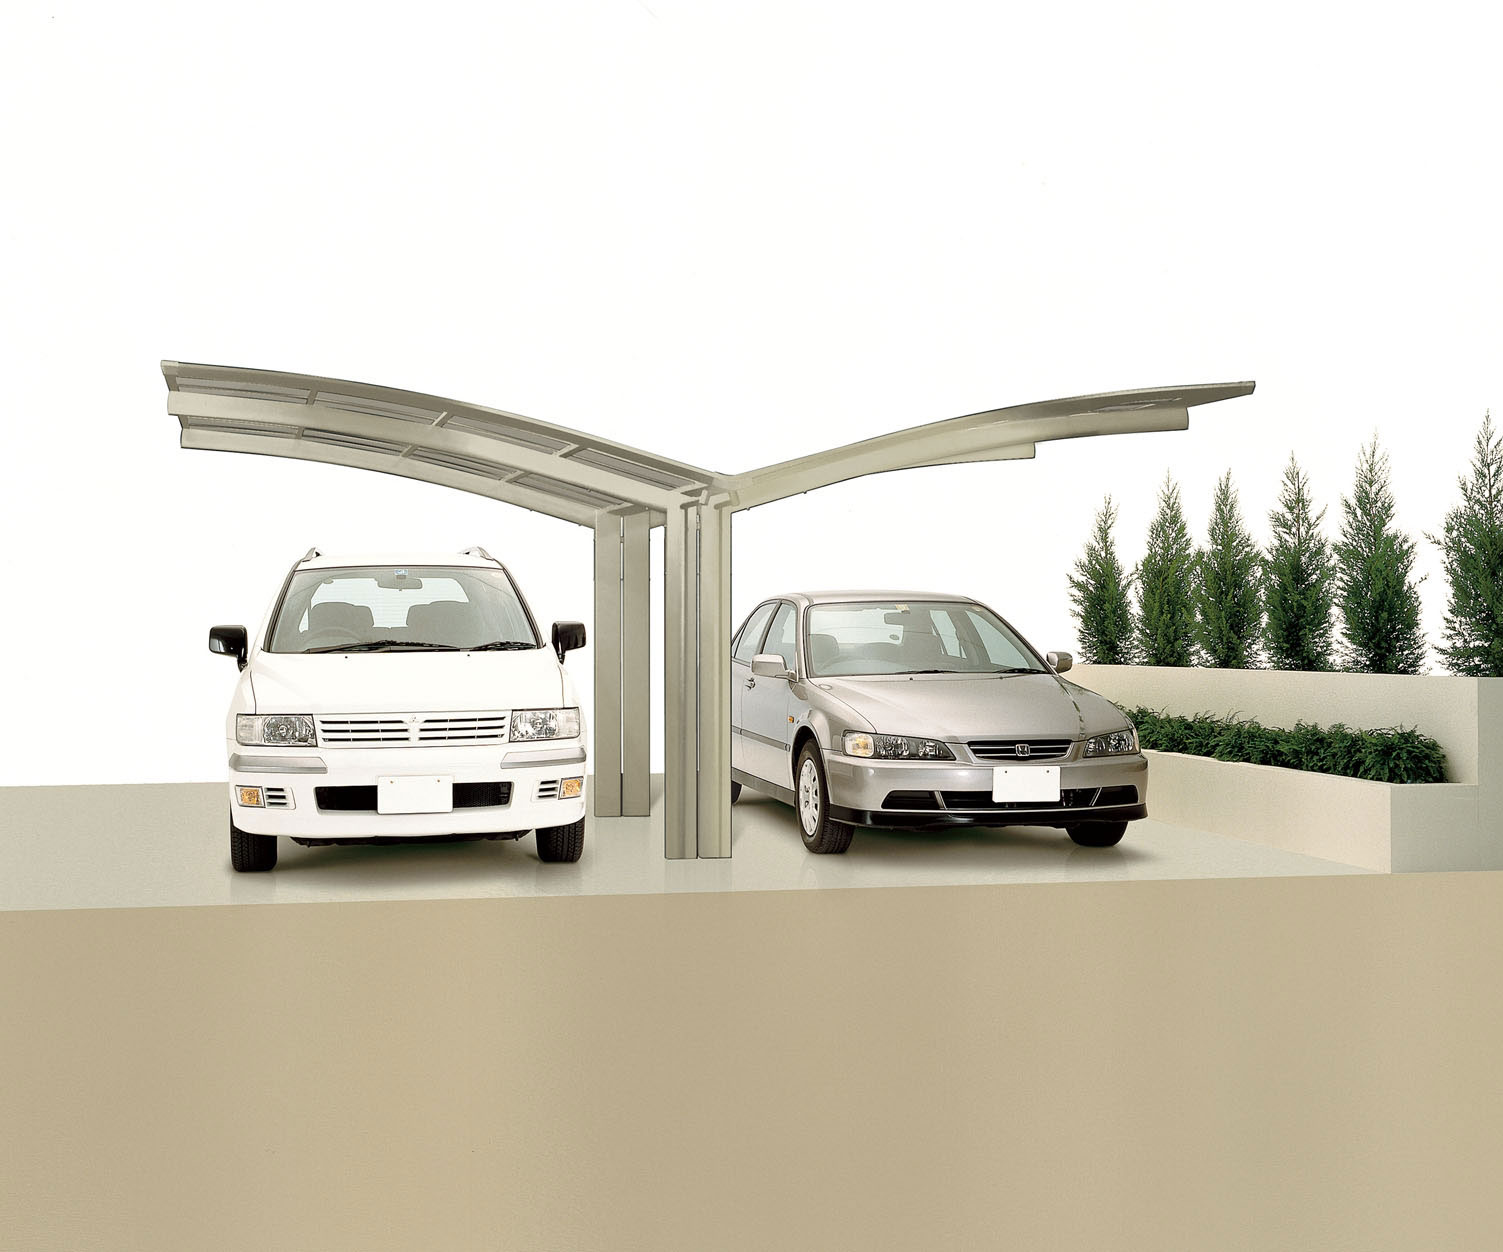 Carport XIMAX Portoforte Alu Typ 80 Y ES 495x543x248cm Bild 1